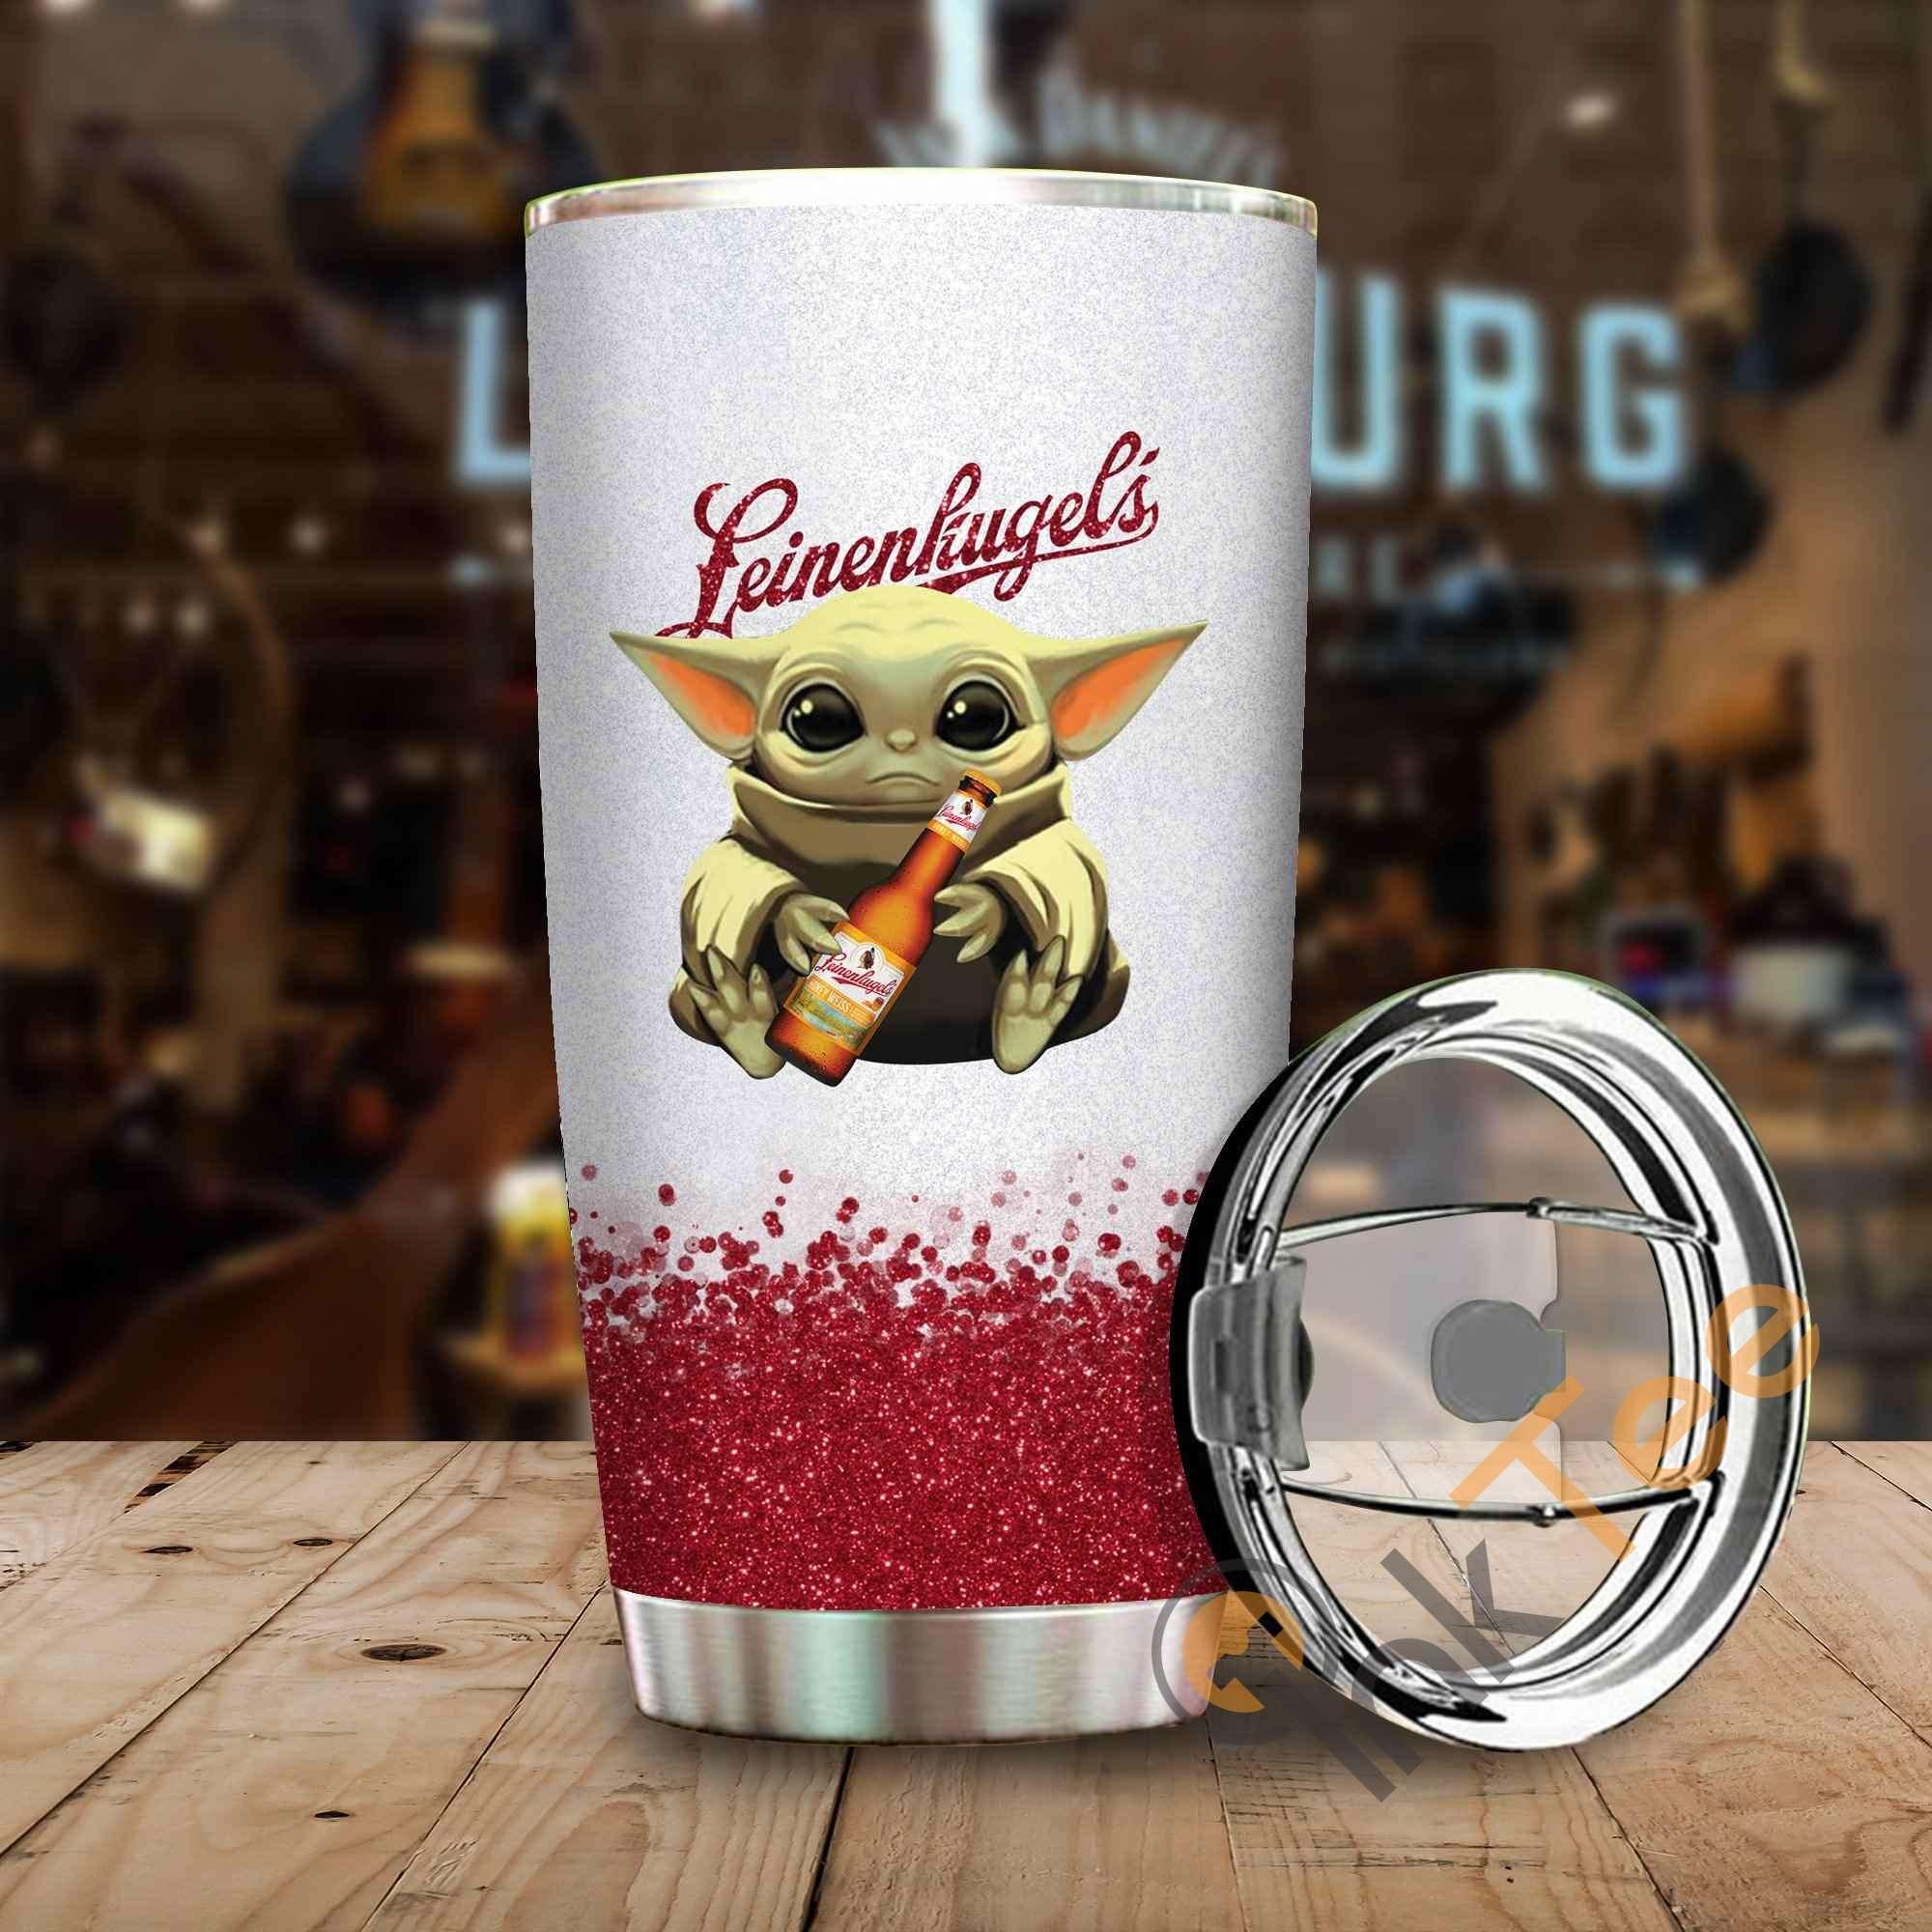 Baby Yoda Hold Leinenkugels Amazon Best Seller Sku 4067 Stainless Steel Tumbler